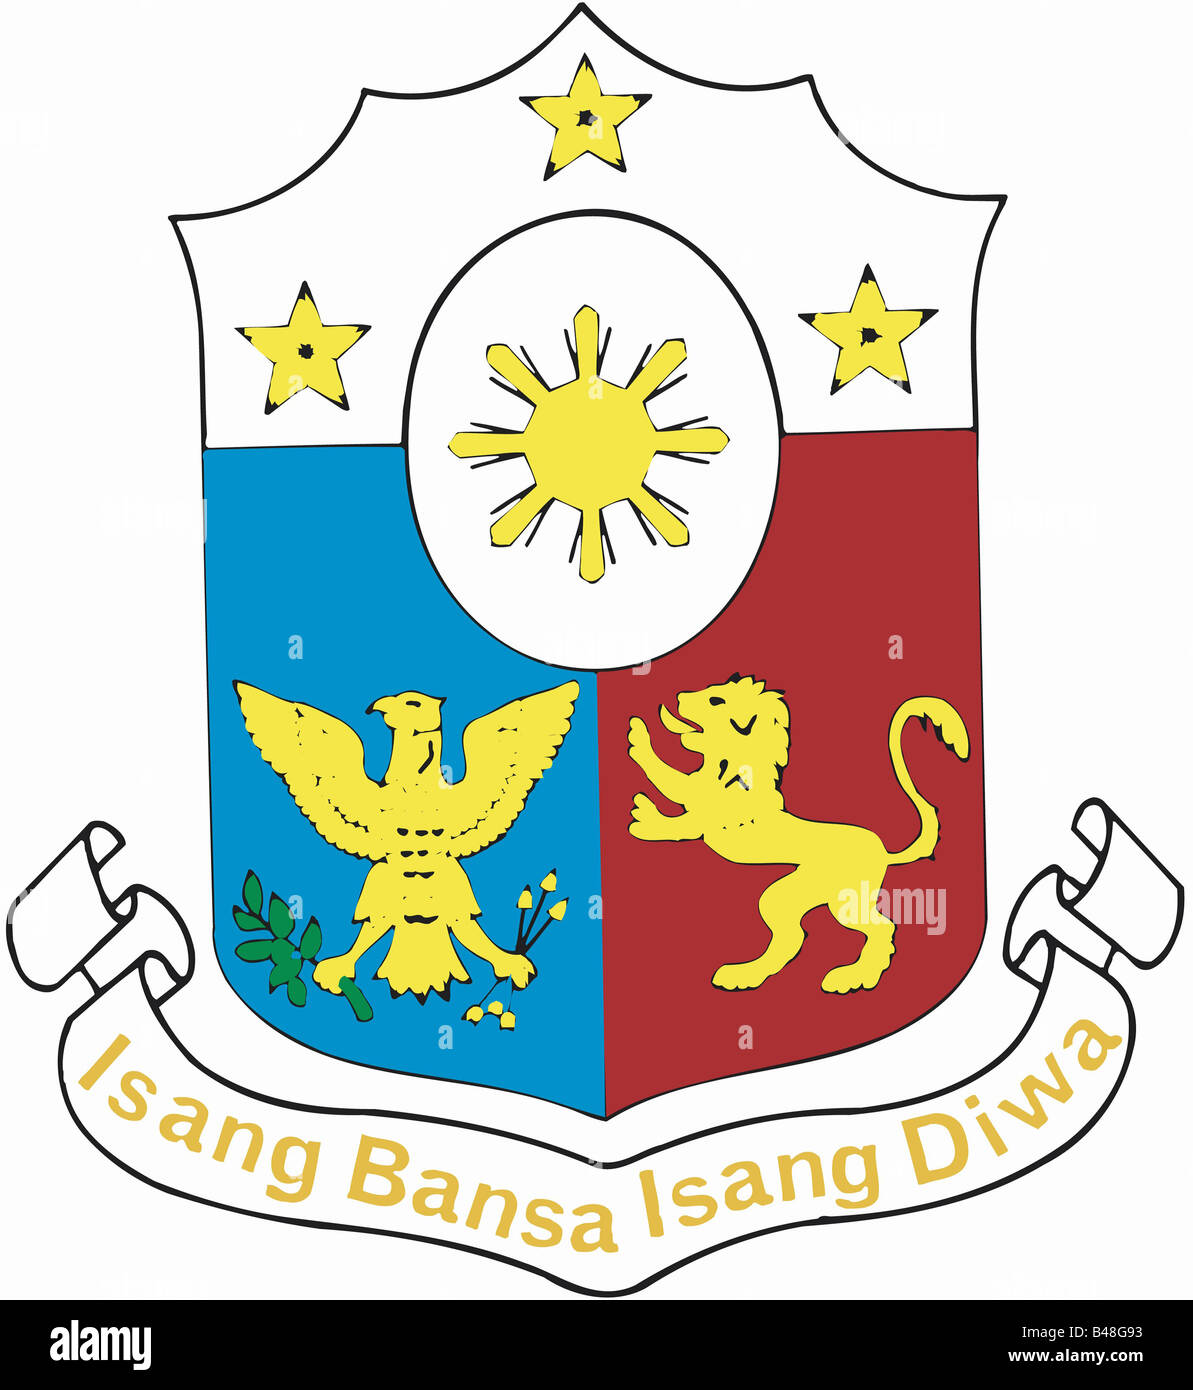 Heraldry coat of arms philippines national coat of arms symbol heraldry coat of arms philippines national coat of arms symbol emblem crest geography asia lion eagle historic histor buycottarizona Images